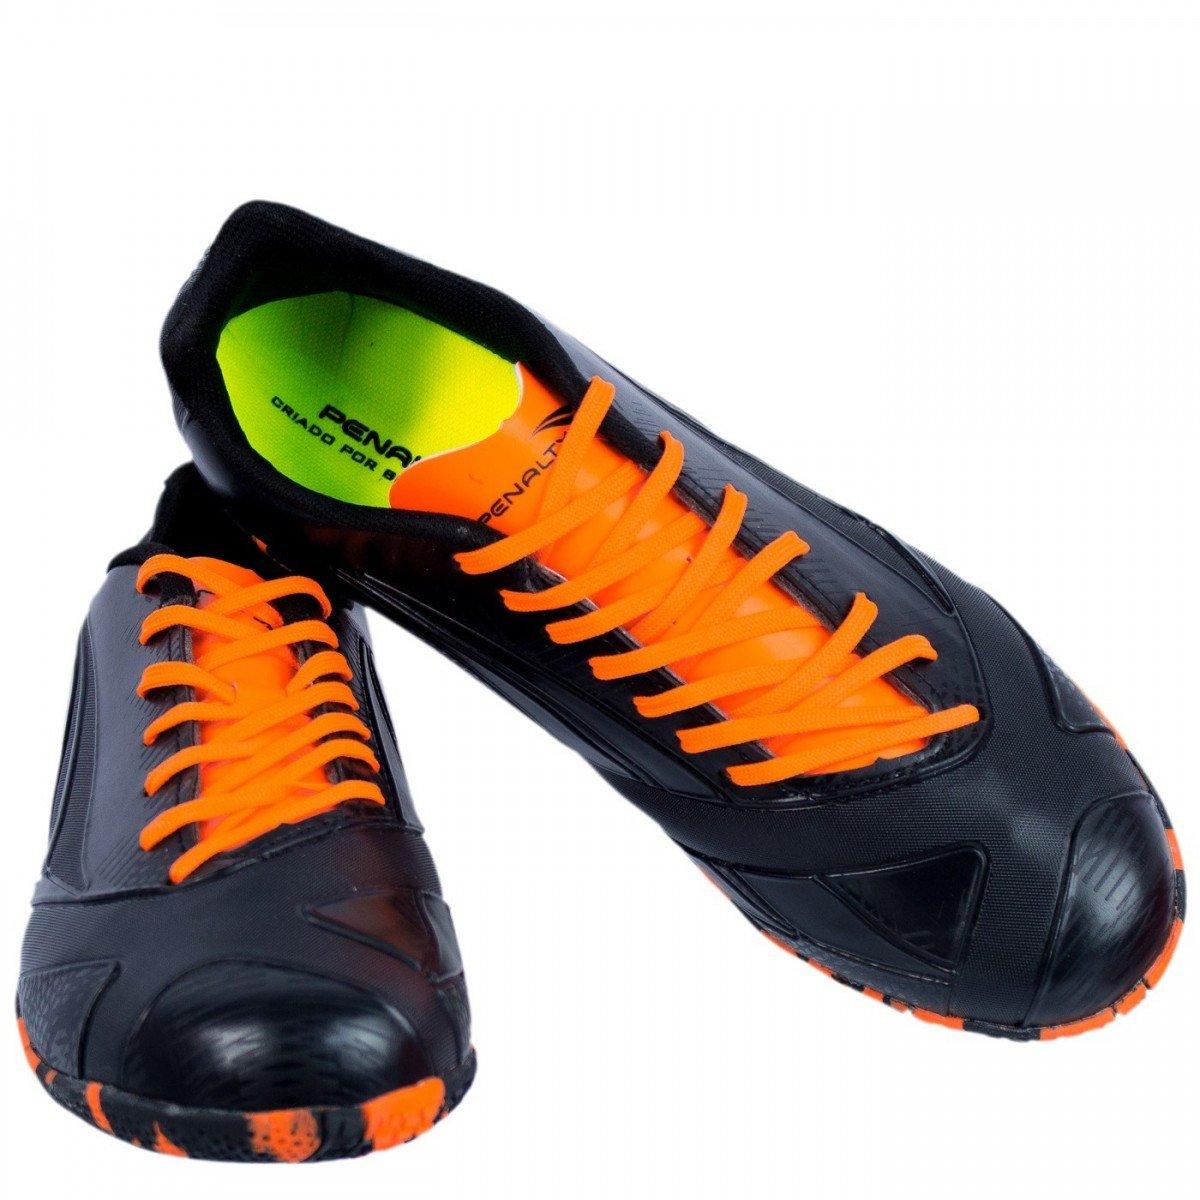 eb28ad8716 Chuteira de Futsal Penalty Victoria RX - Preto - Compre Agora